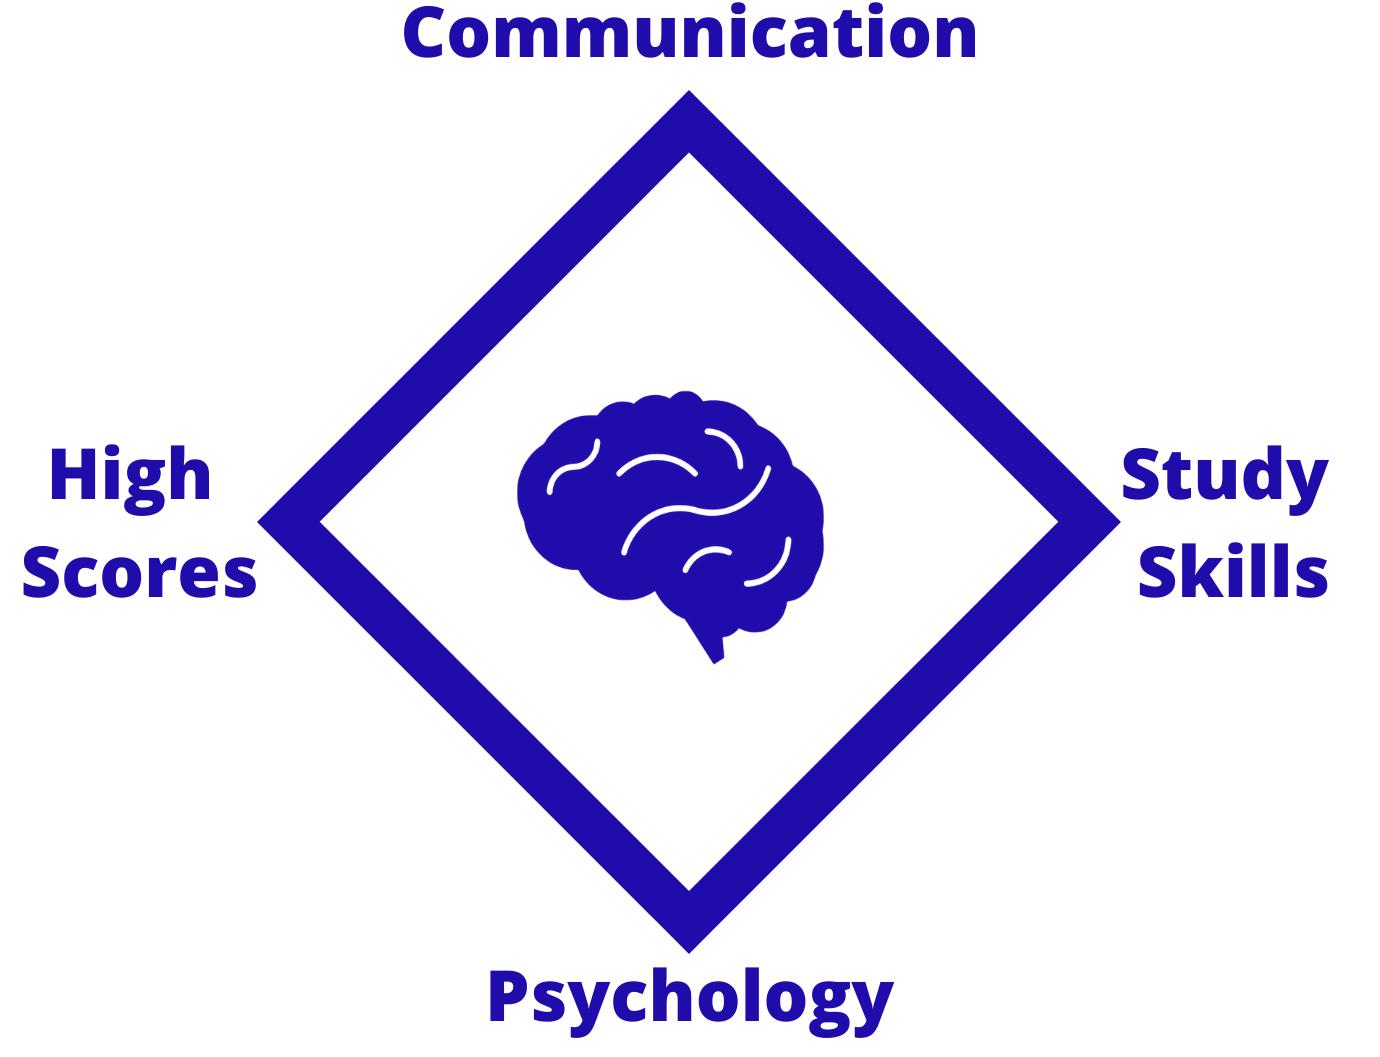 KIS hires tutors based on High Scores, Communication, Study Skills, Psychology